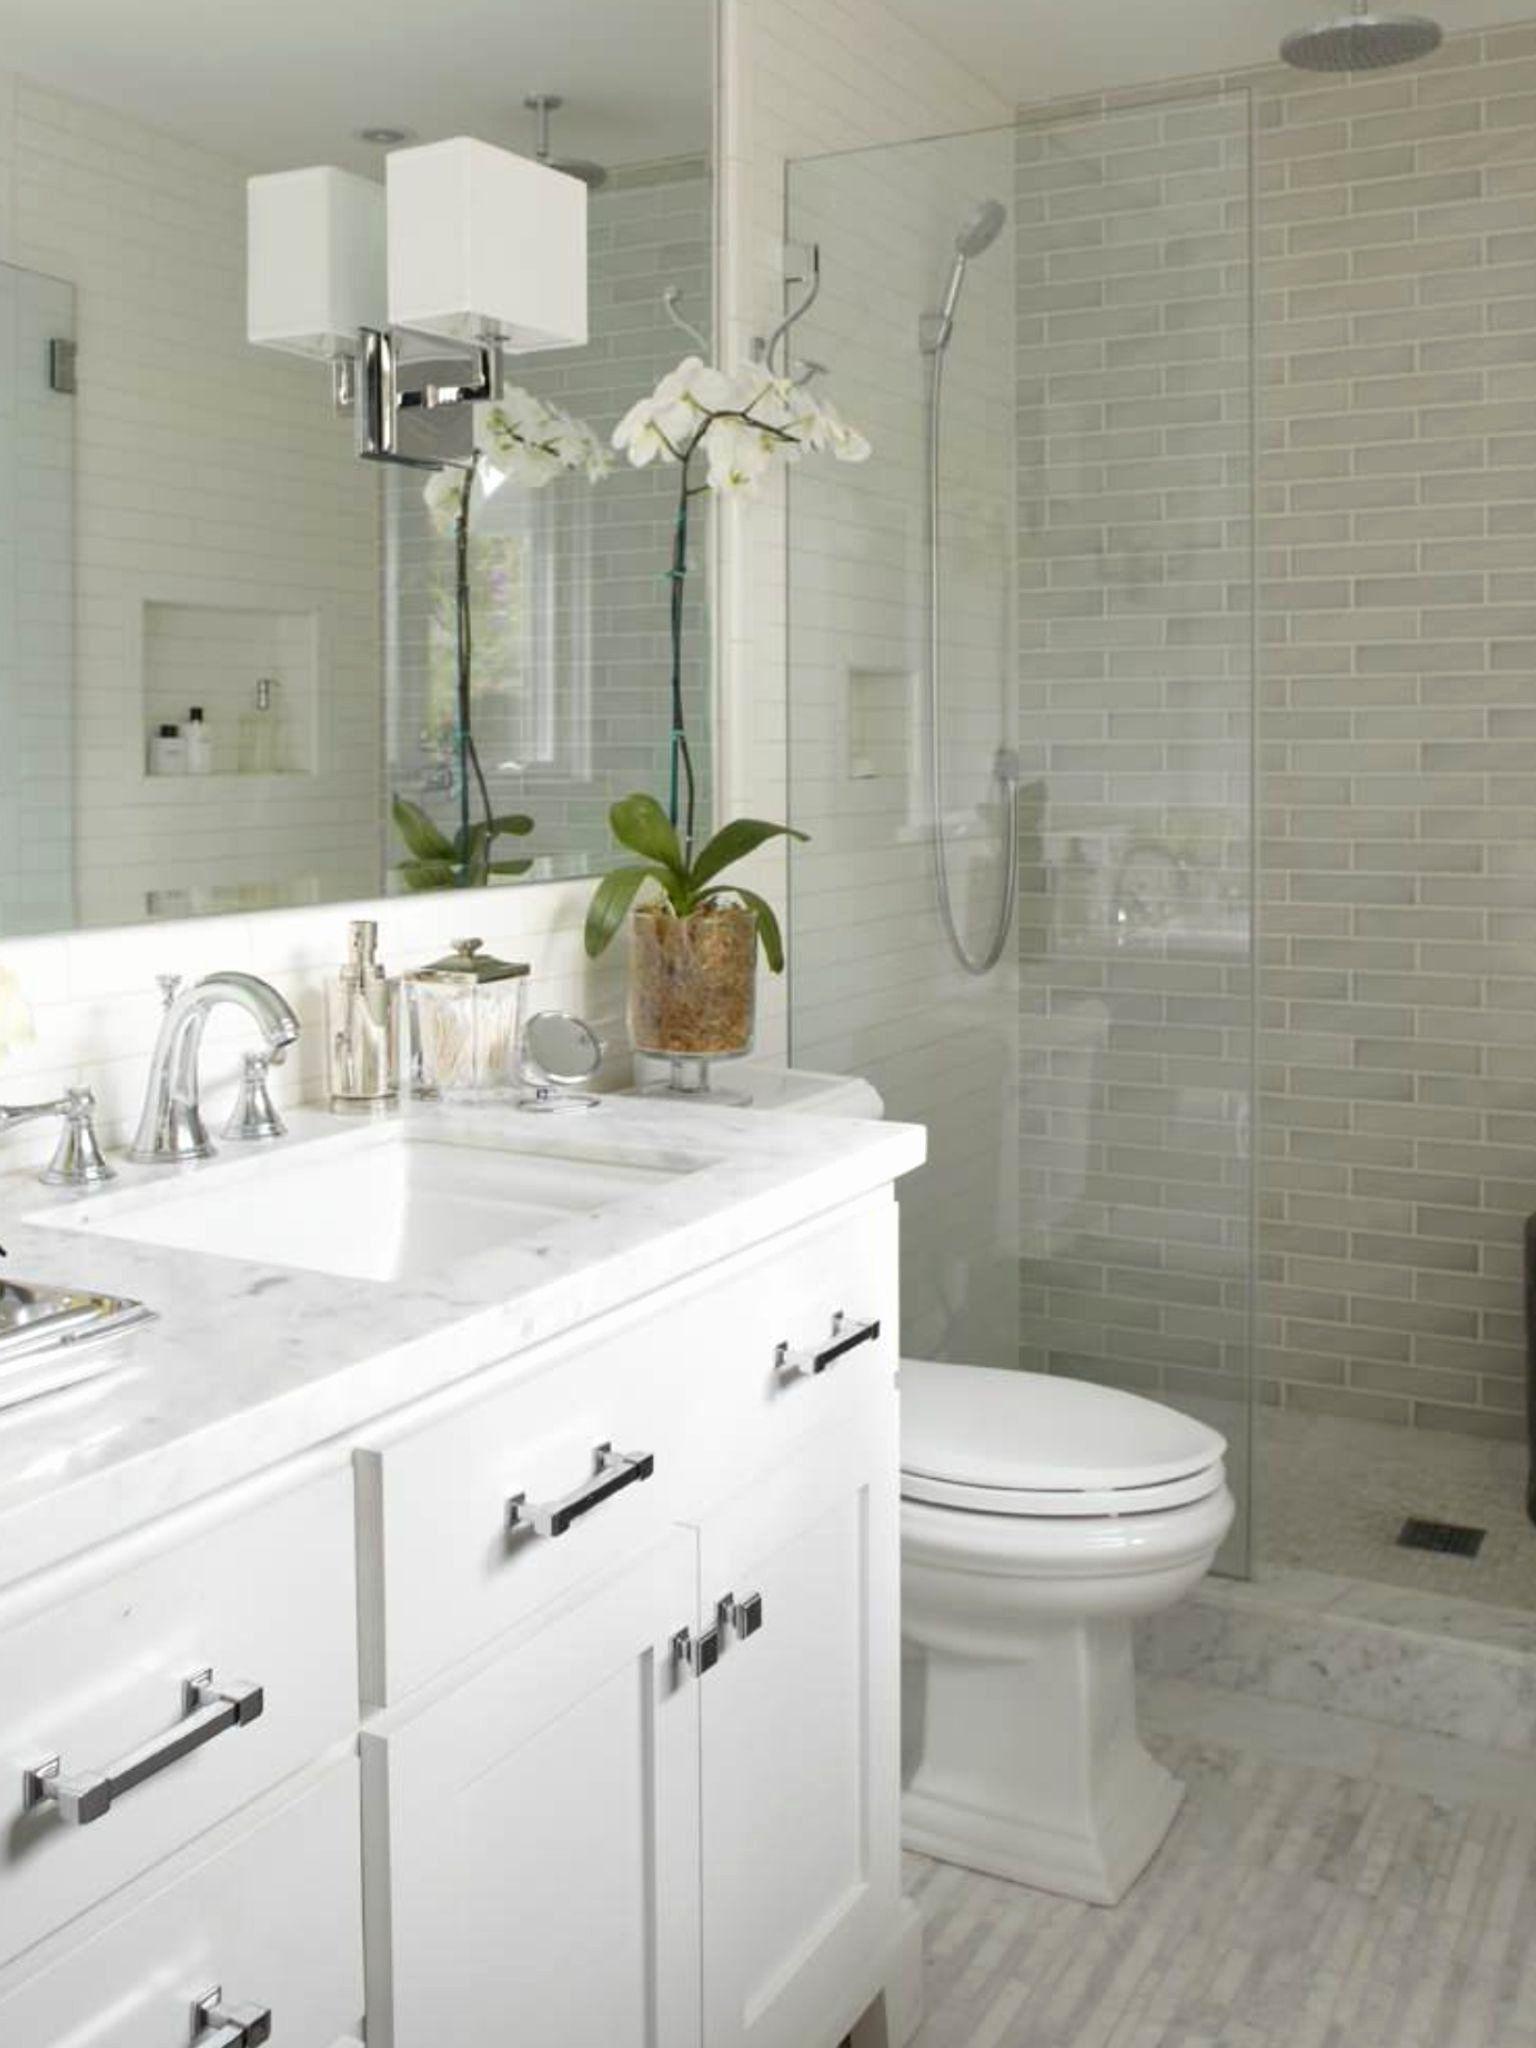 Houzz Bathroom Tile Ideas Elegant Houzz Rectangle Tiles Bathroom Ideas Pinterest In 2020 Bathroom Design Small Modern Bathroom Design Small Small Bathroom With Shower